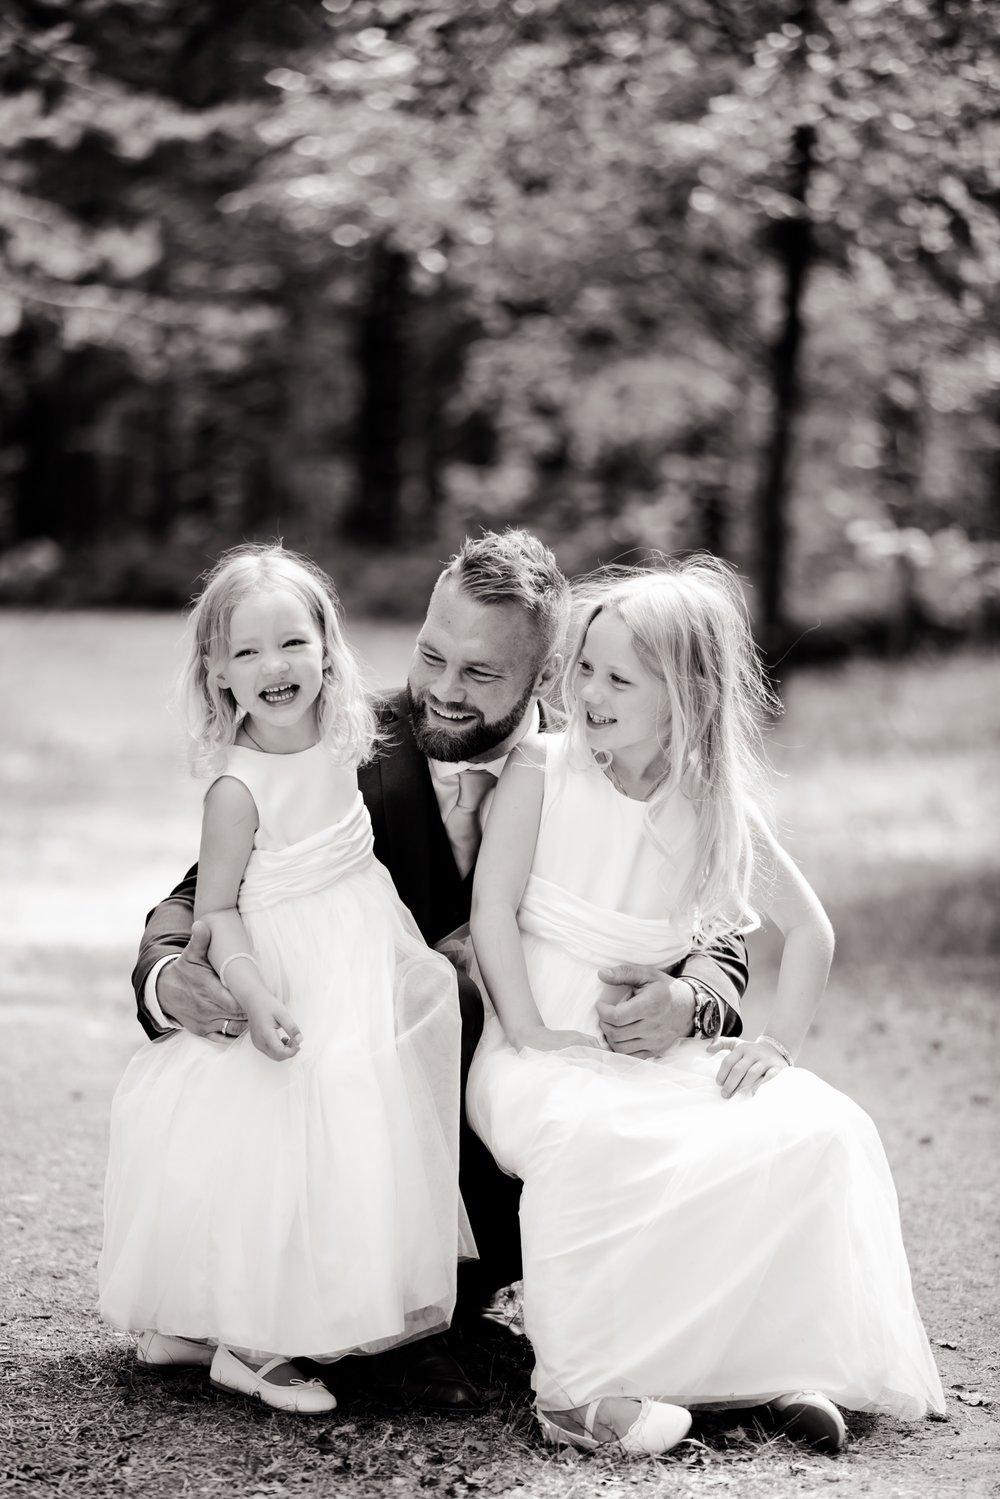 043_weddingphotographer_Bryllupsfotografering_Bryllupsbilder_fatmonkeyfoto_Bryllupsfotograf.jpg